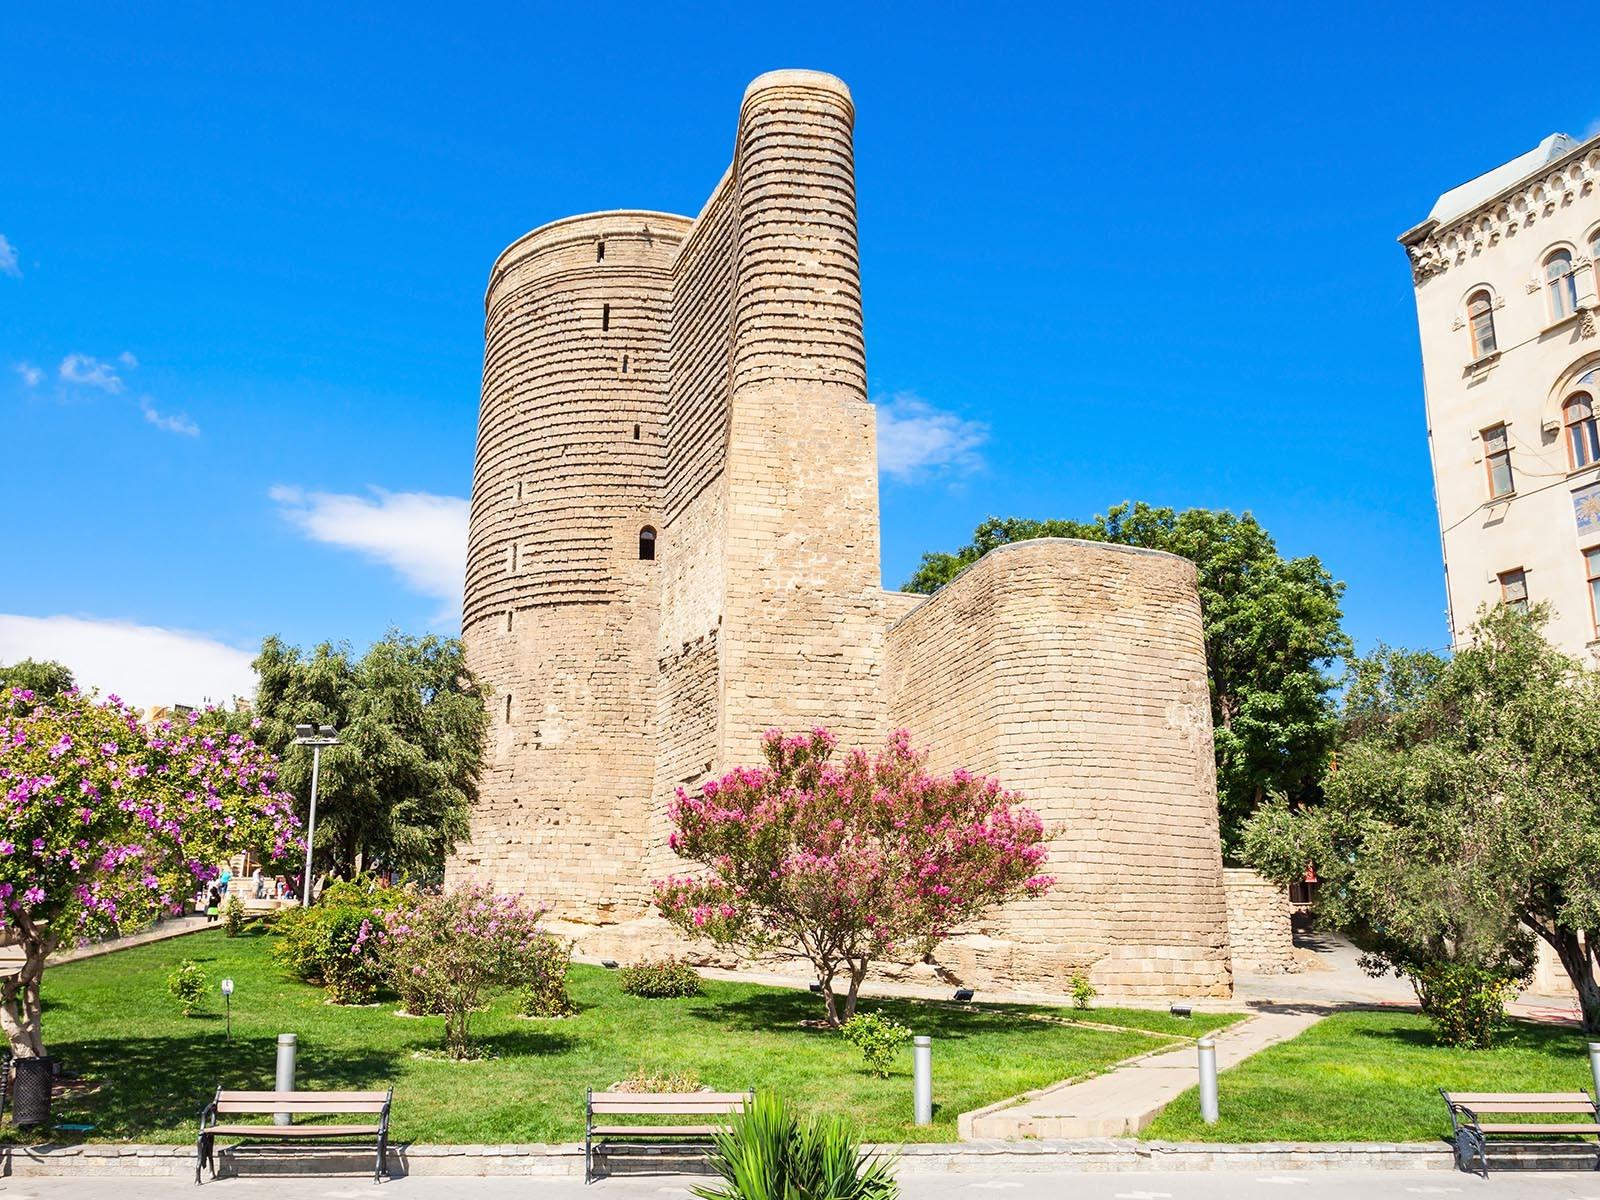 skypark holidays-Exciting Package of Azerbaijan